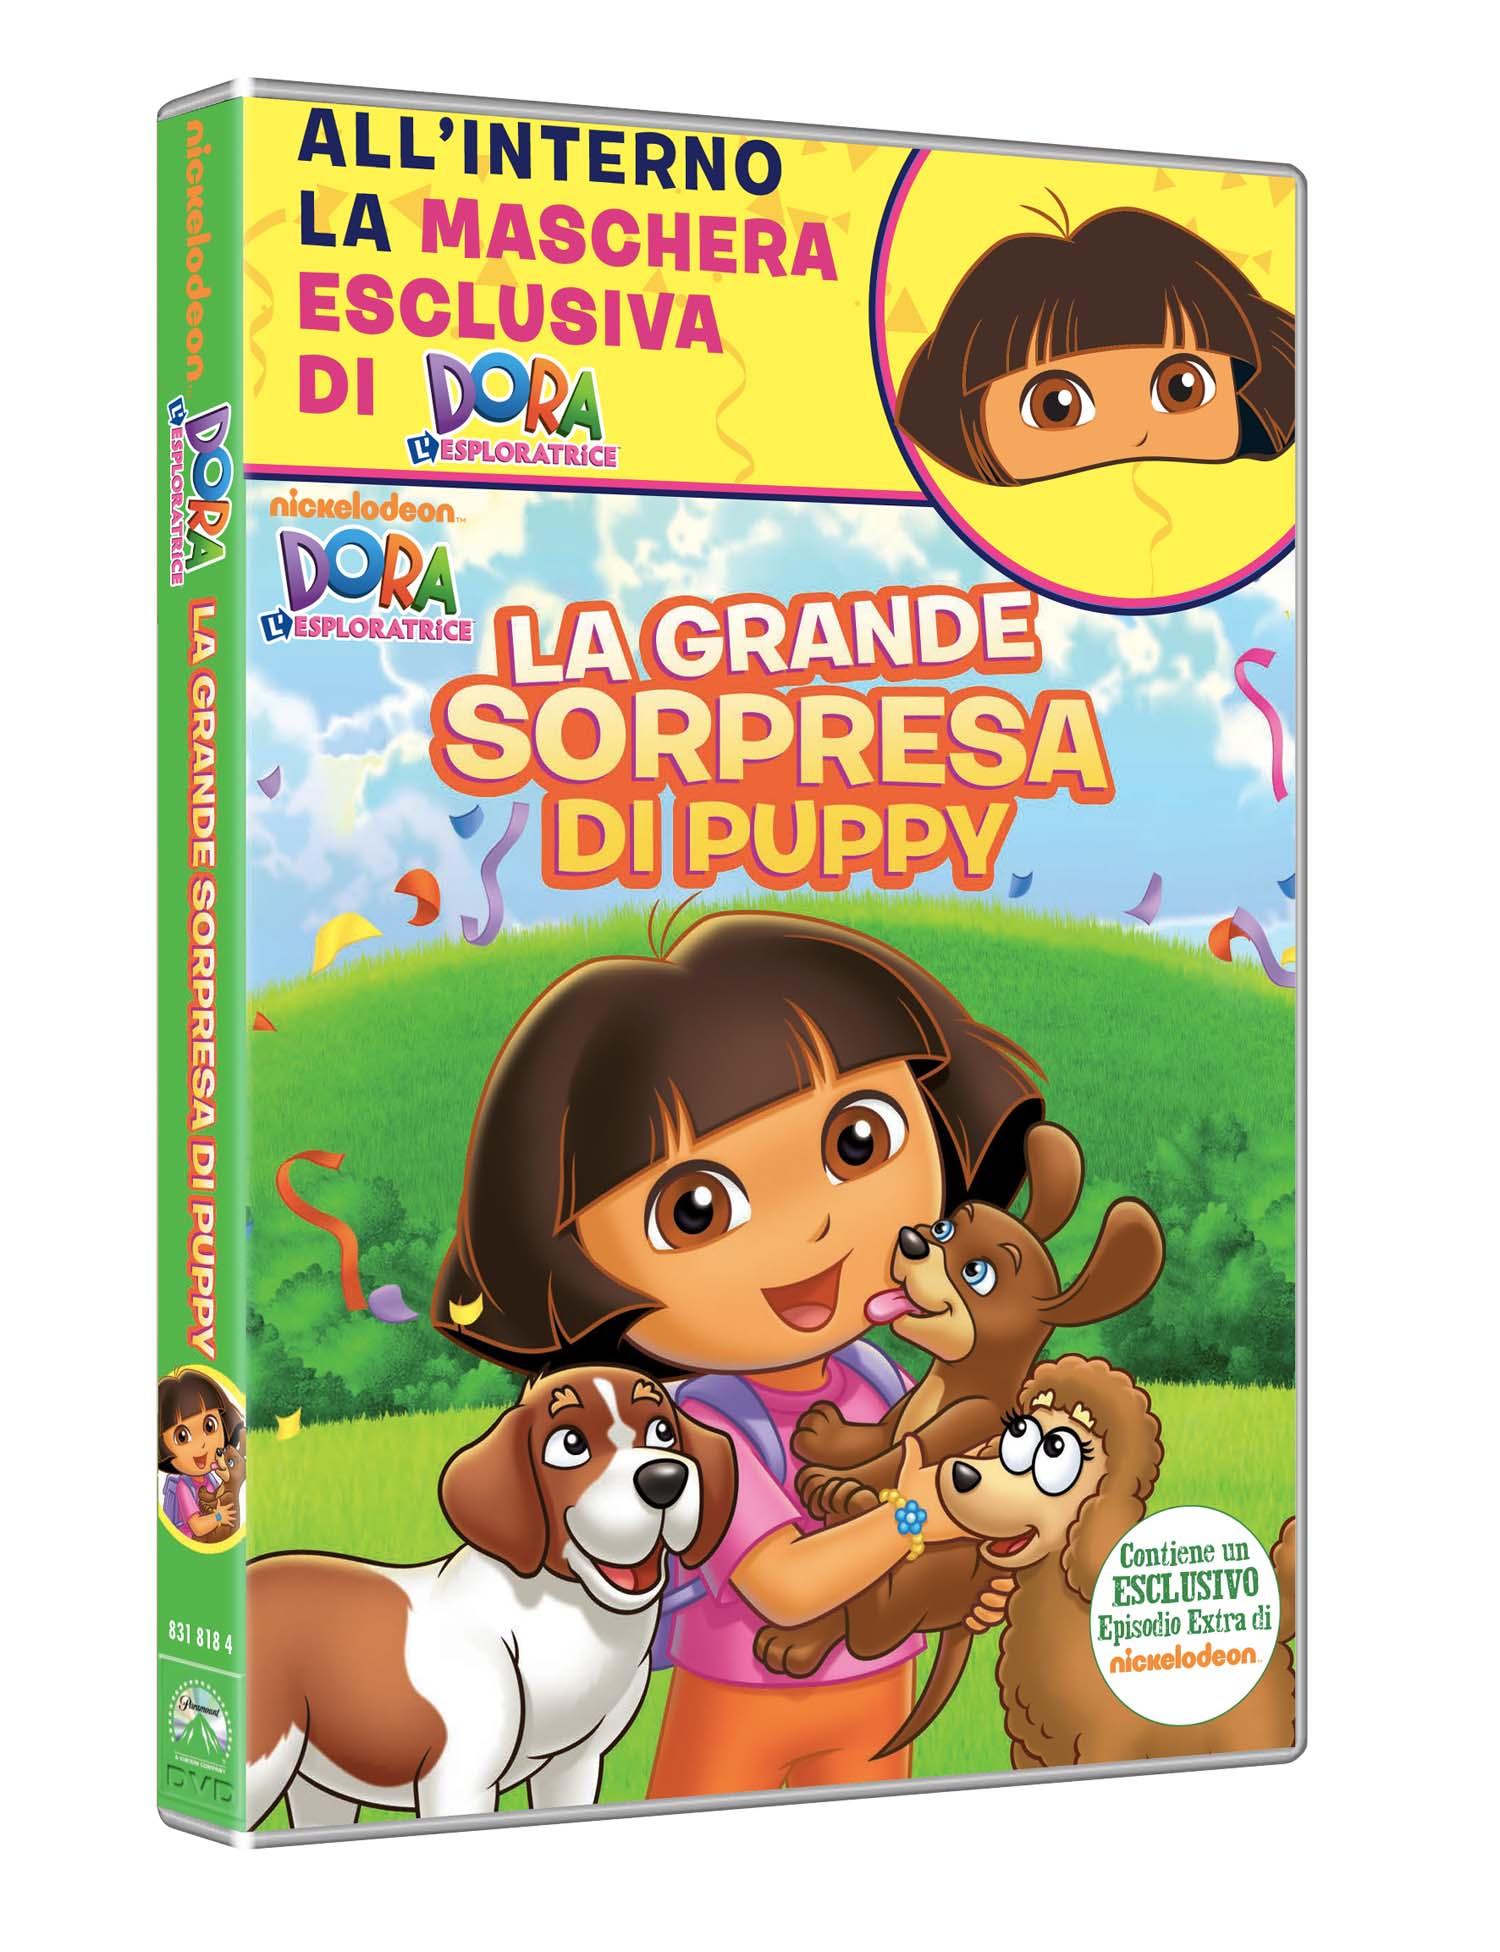 DORA L'ESPLORATRICE - LA GRANDE SORPRESA DI PUPPY (DVD+MASCHERA